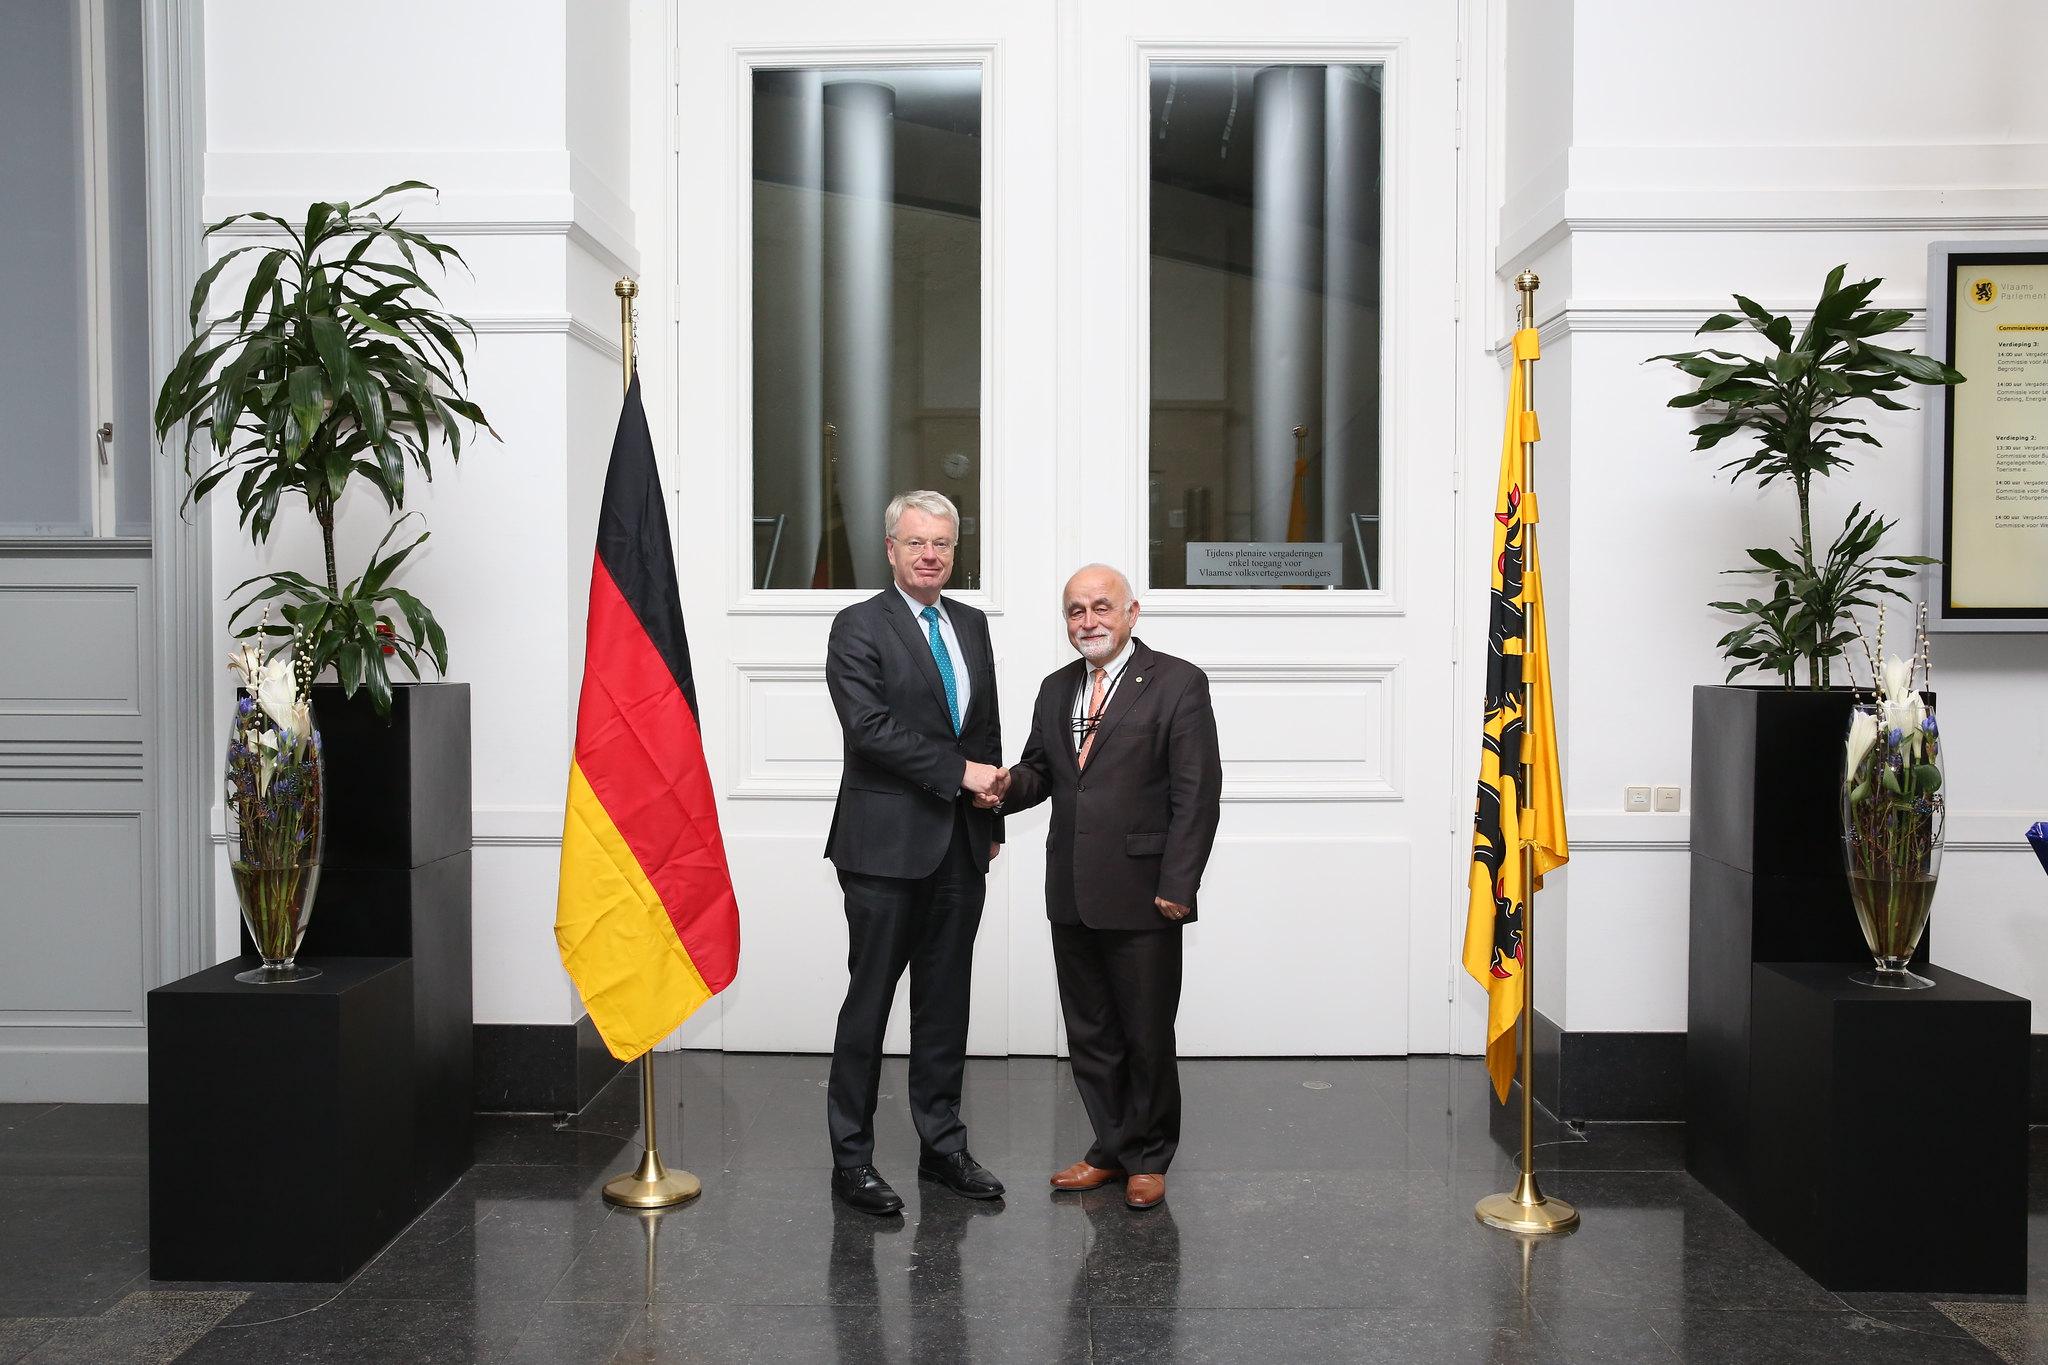 24 november 2015 Ontvangst van de Ambassadeur van Duitsland